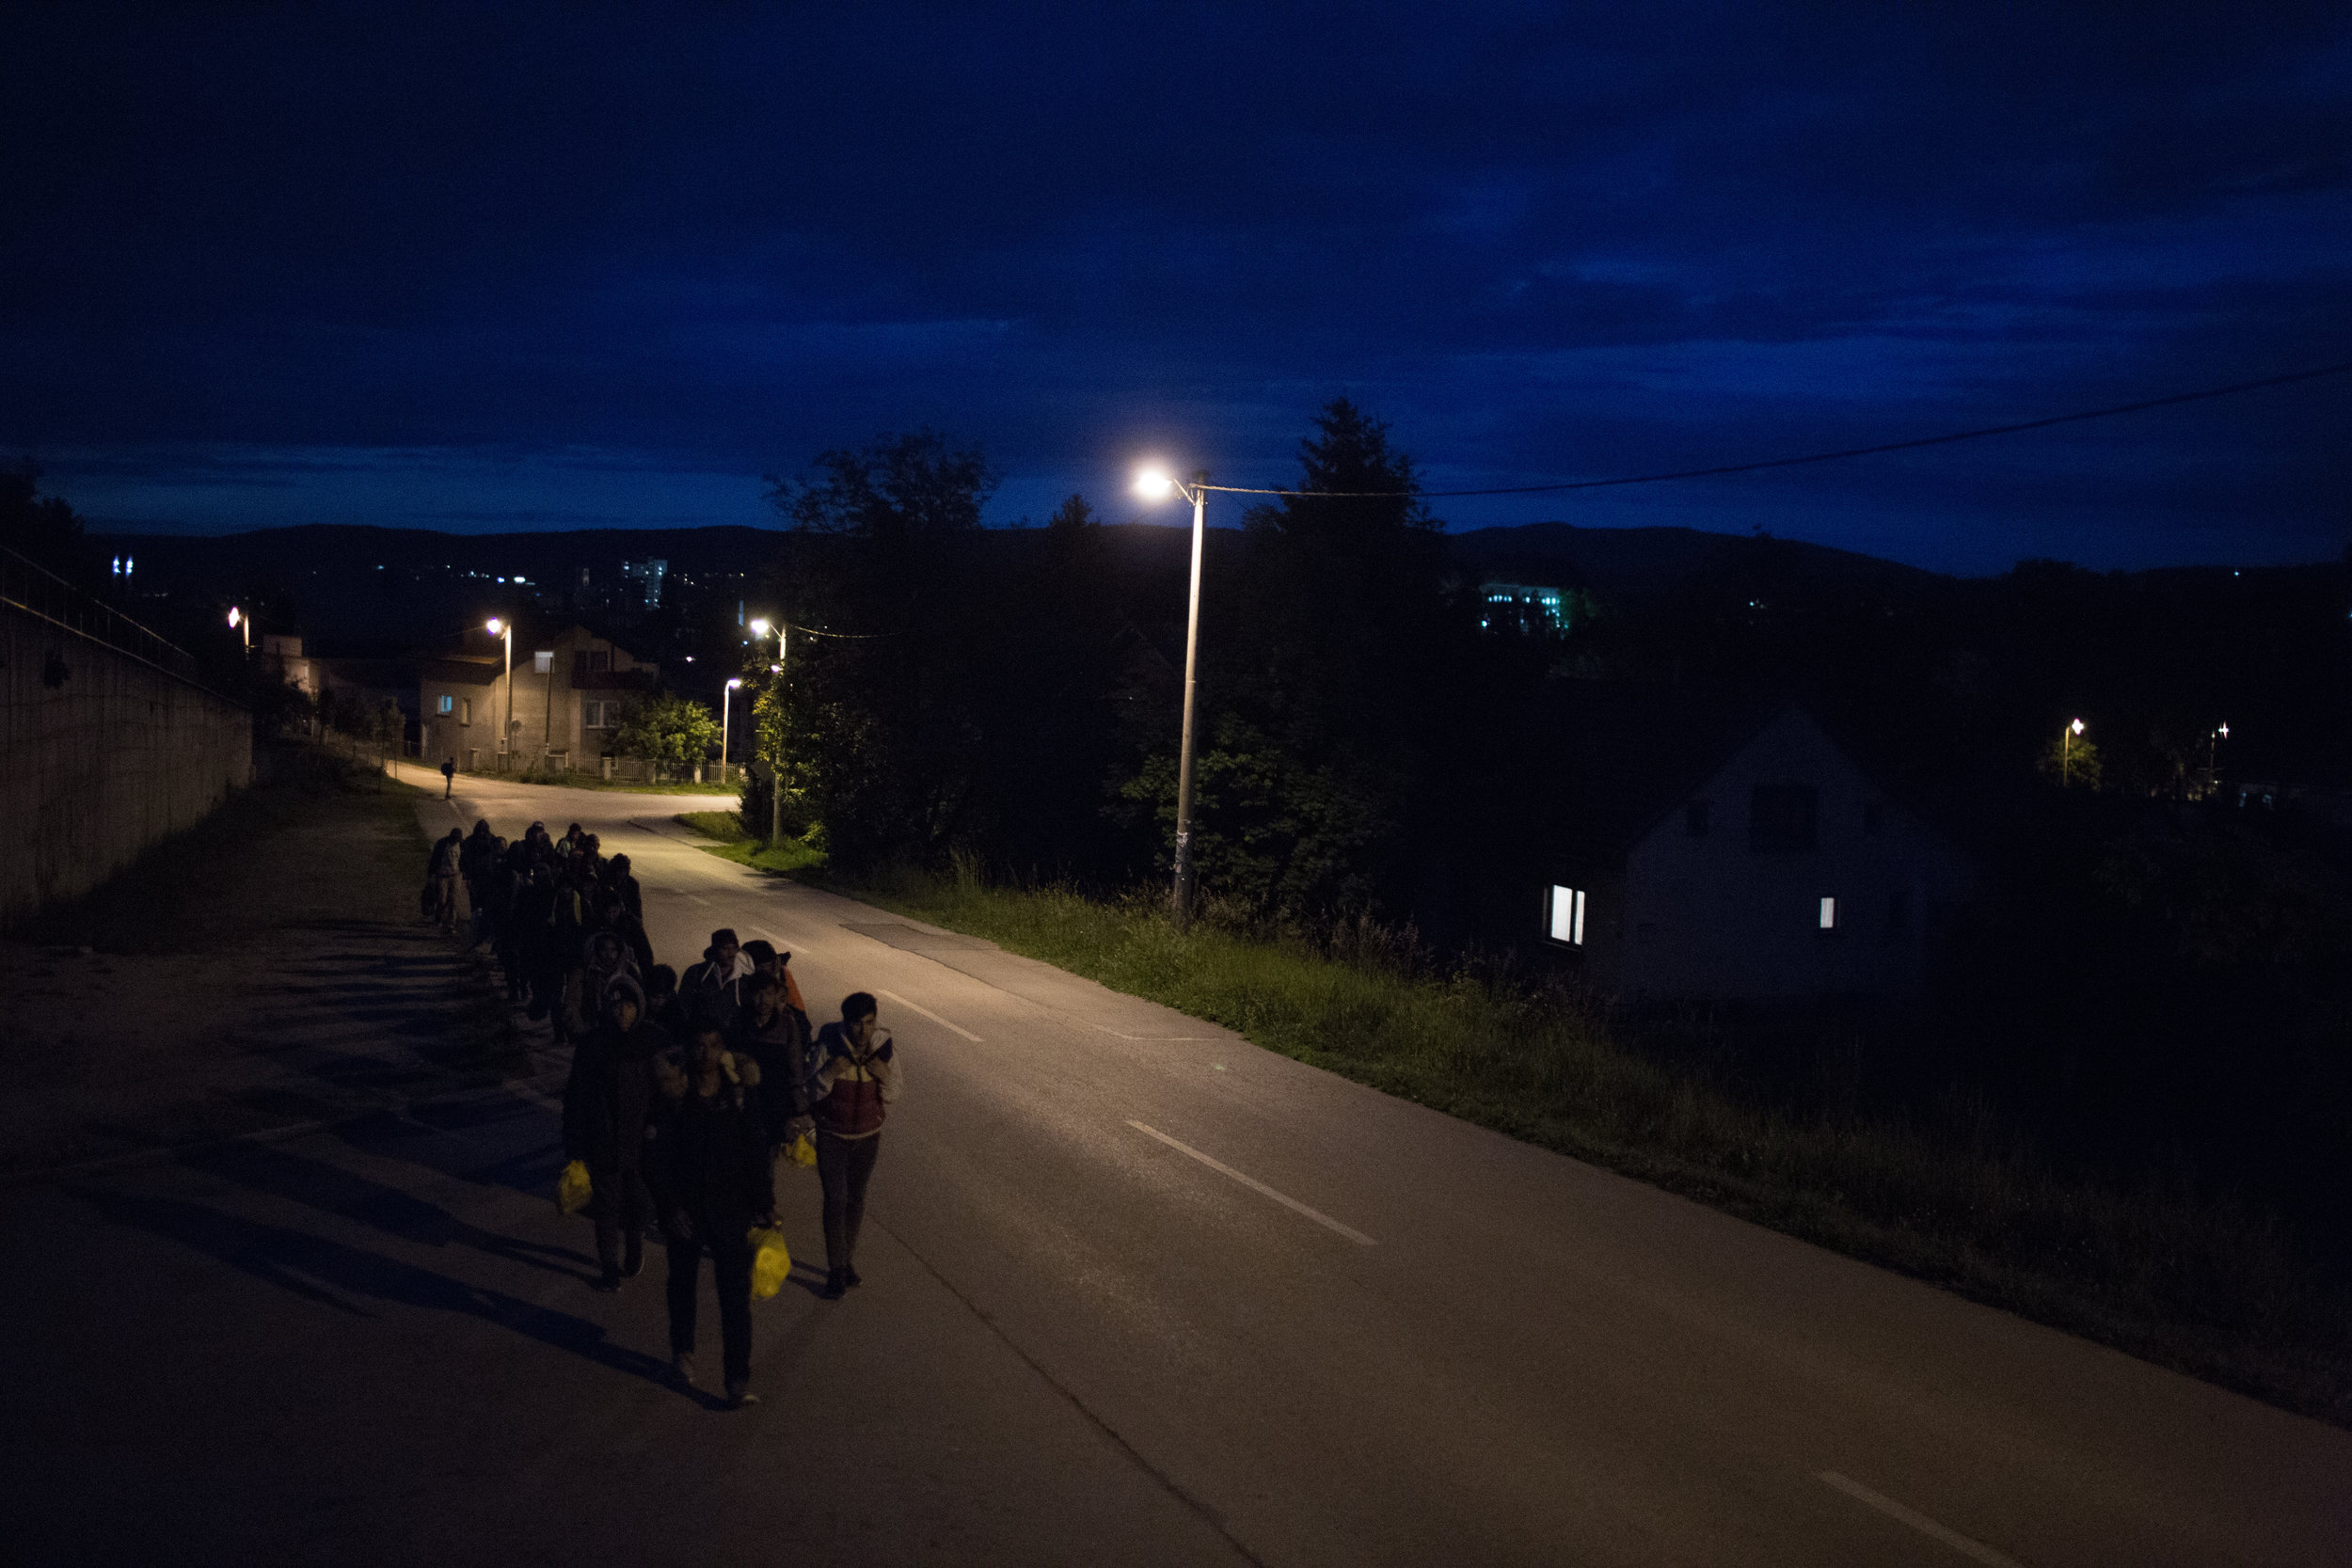 A group of migrants on a night walk near Zavalje in BiH towards Croatia.